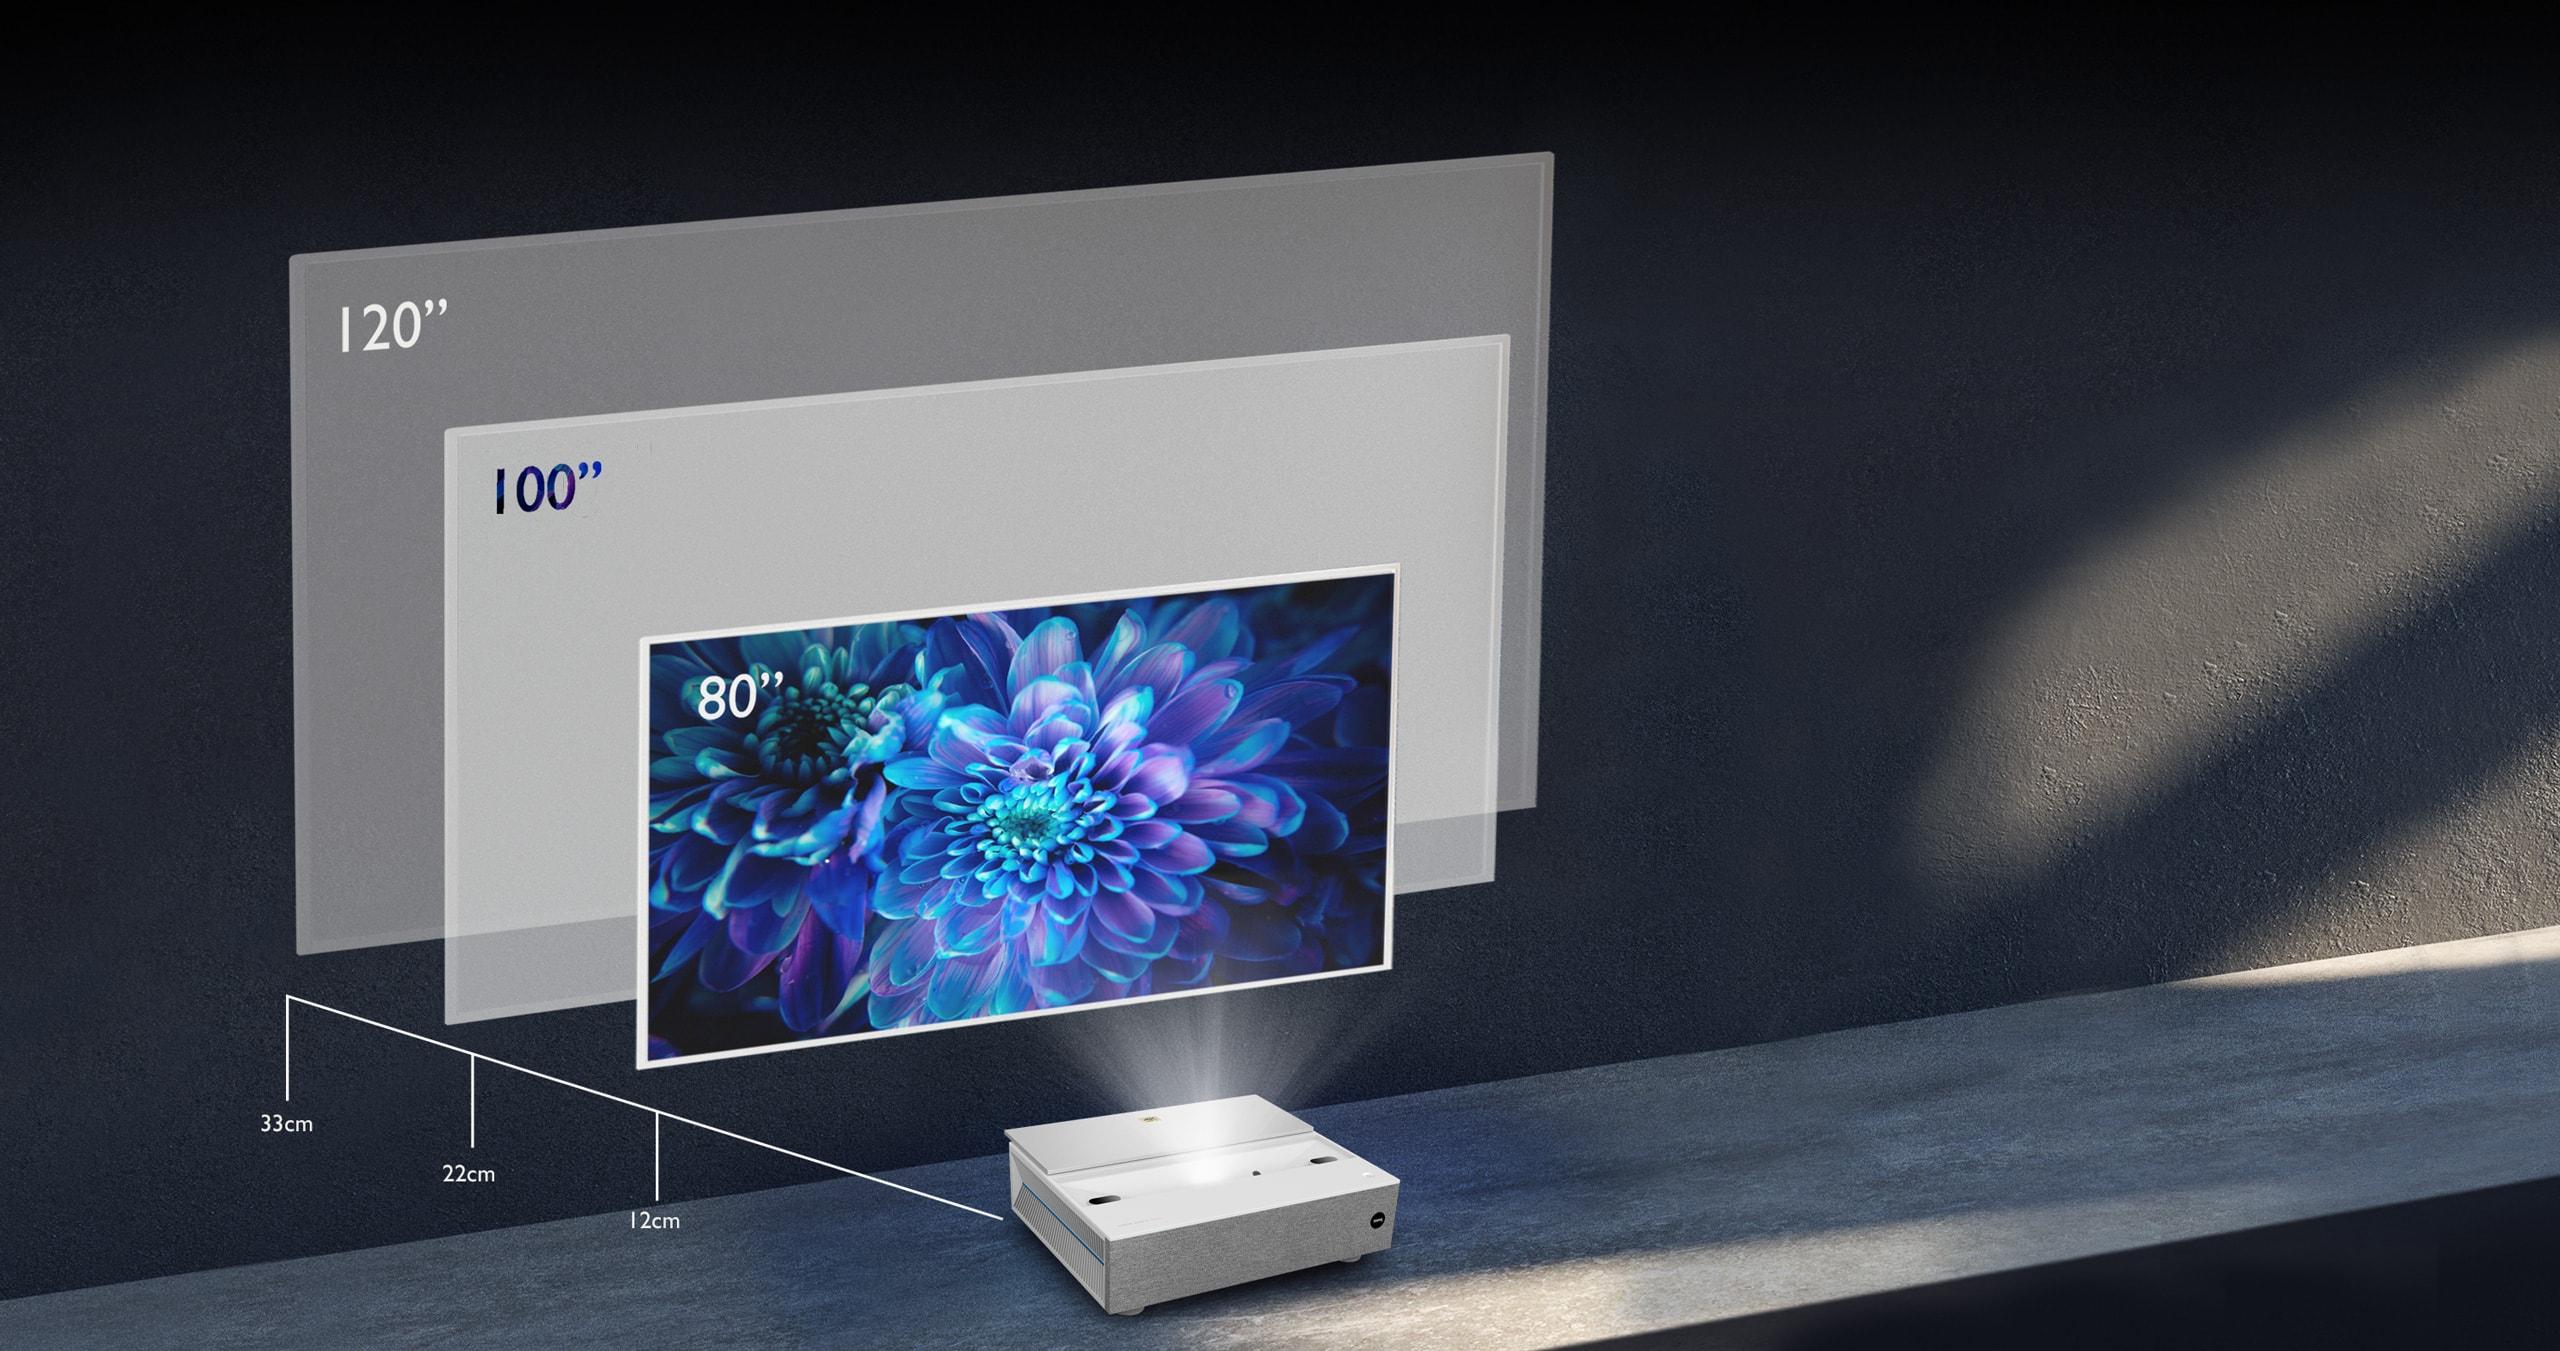 projector-lastertv-v6050-distance-w-min.